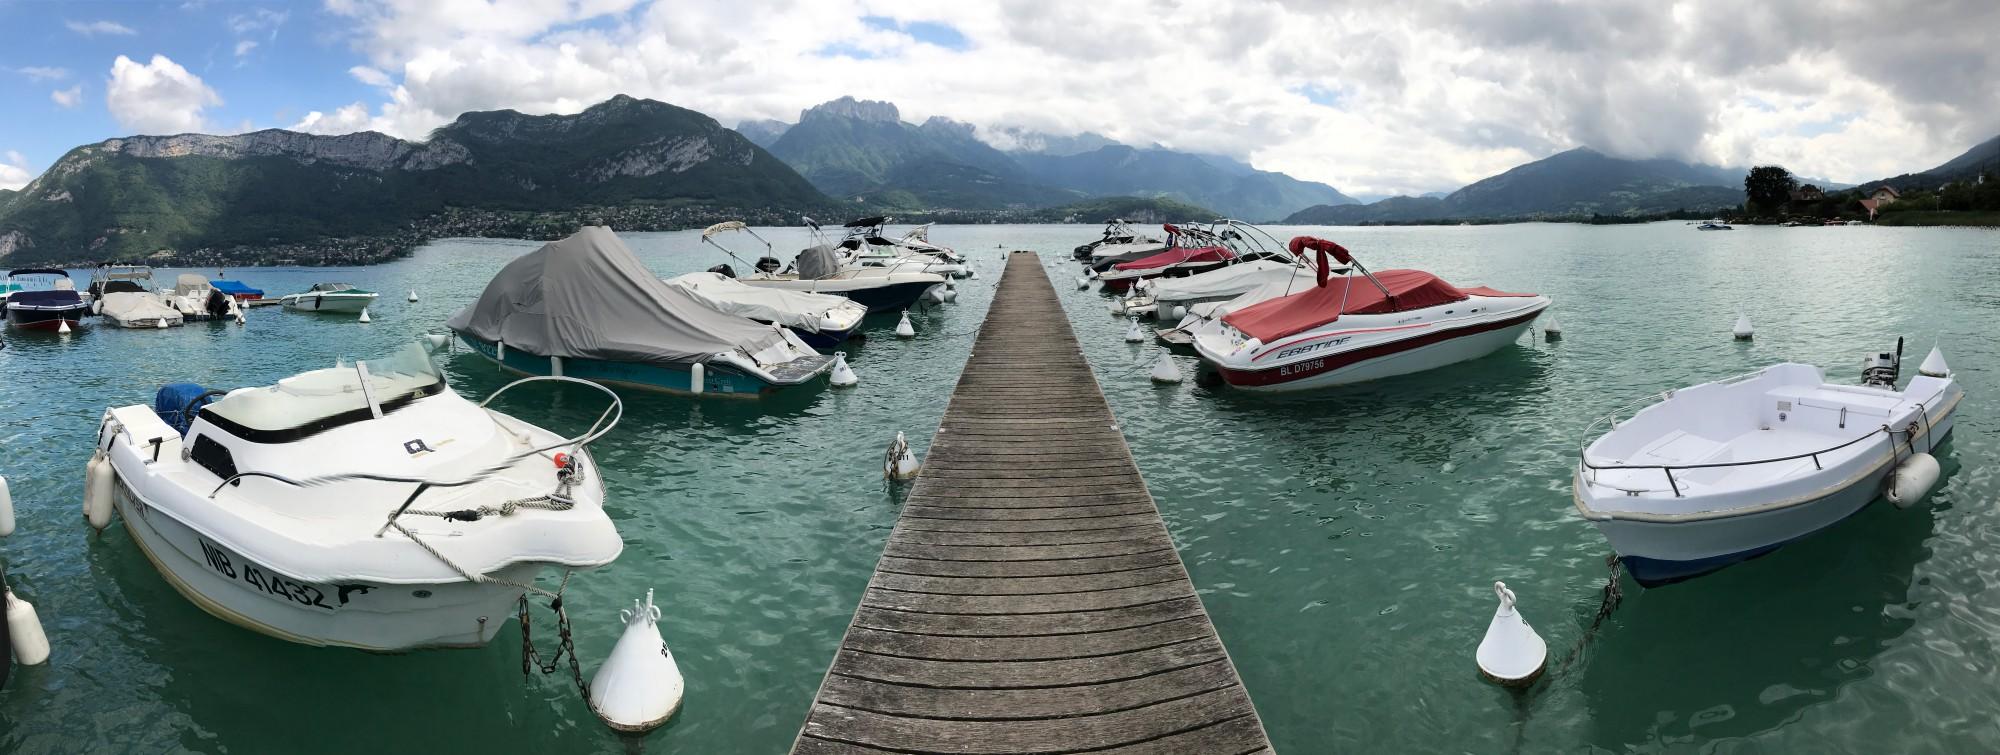 Annecy-Lago-de-annecy